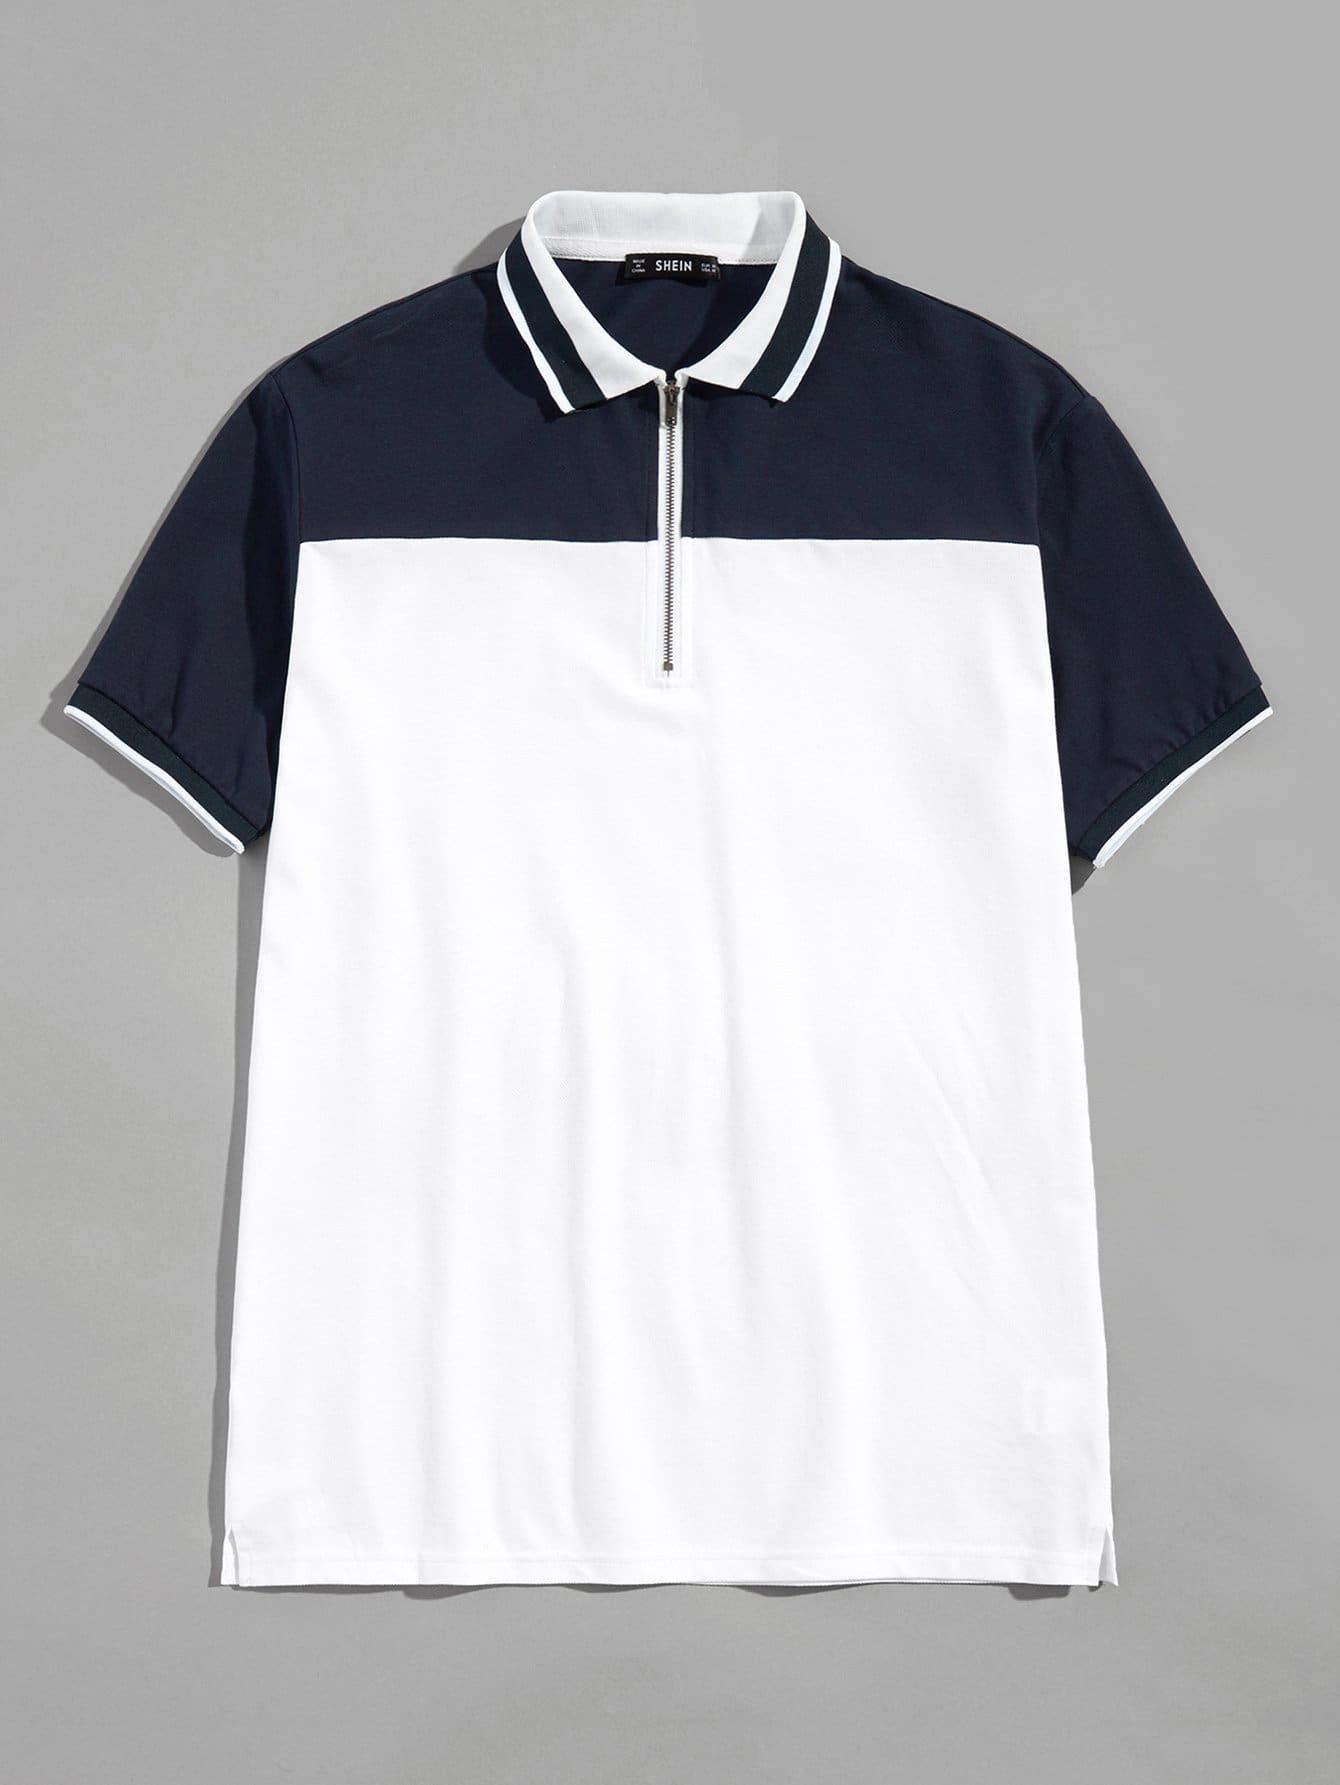 Купить Для мужчин Рубашка поло на молнии, null, SheIn